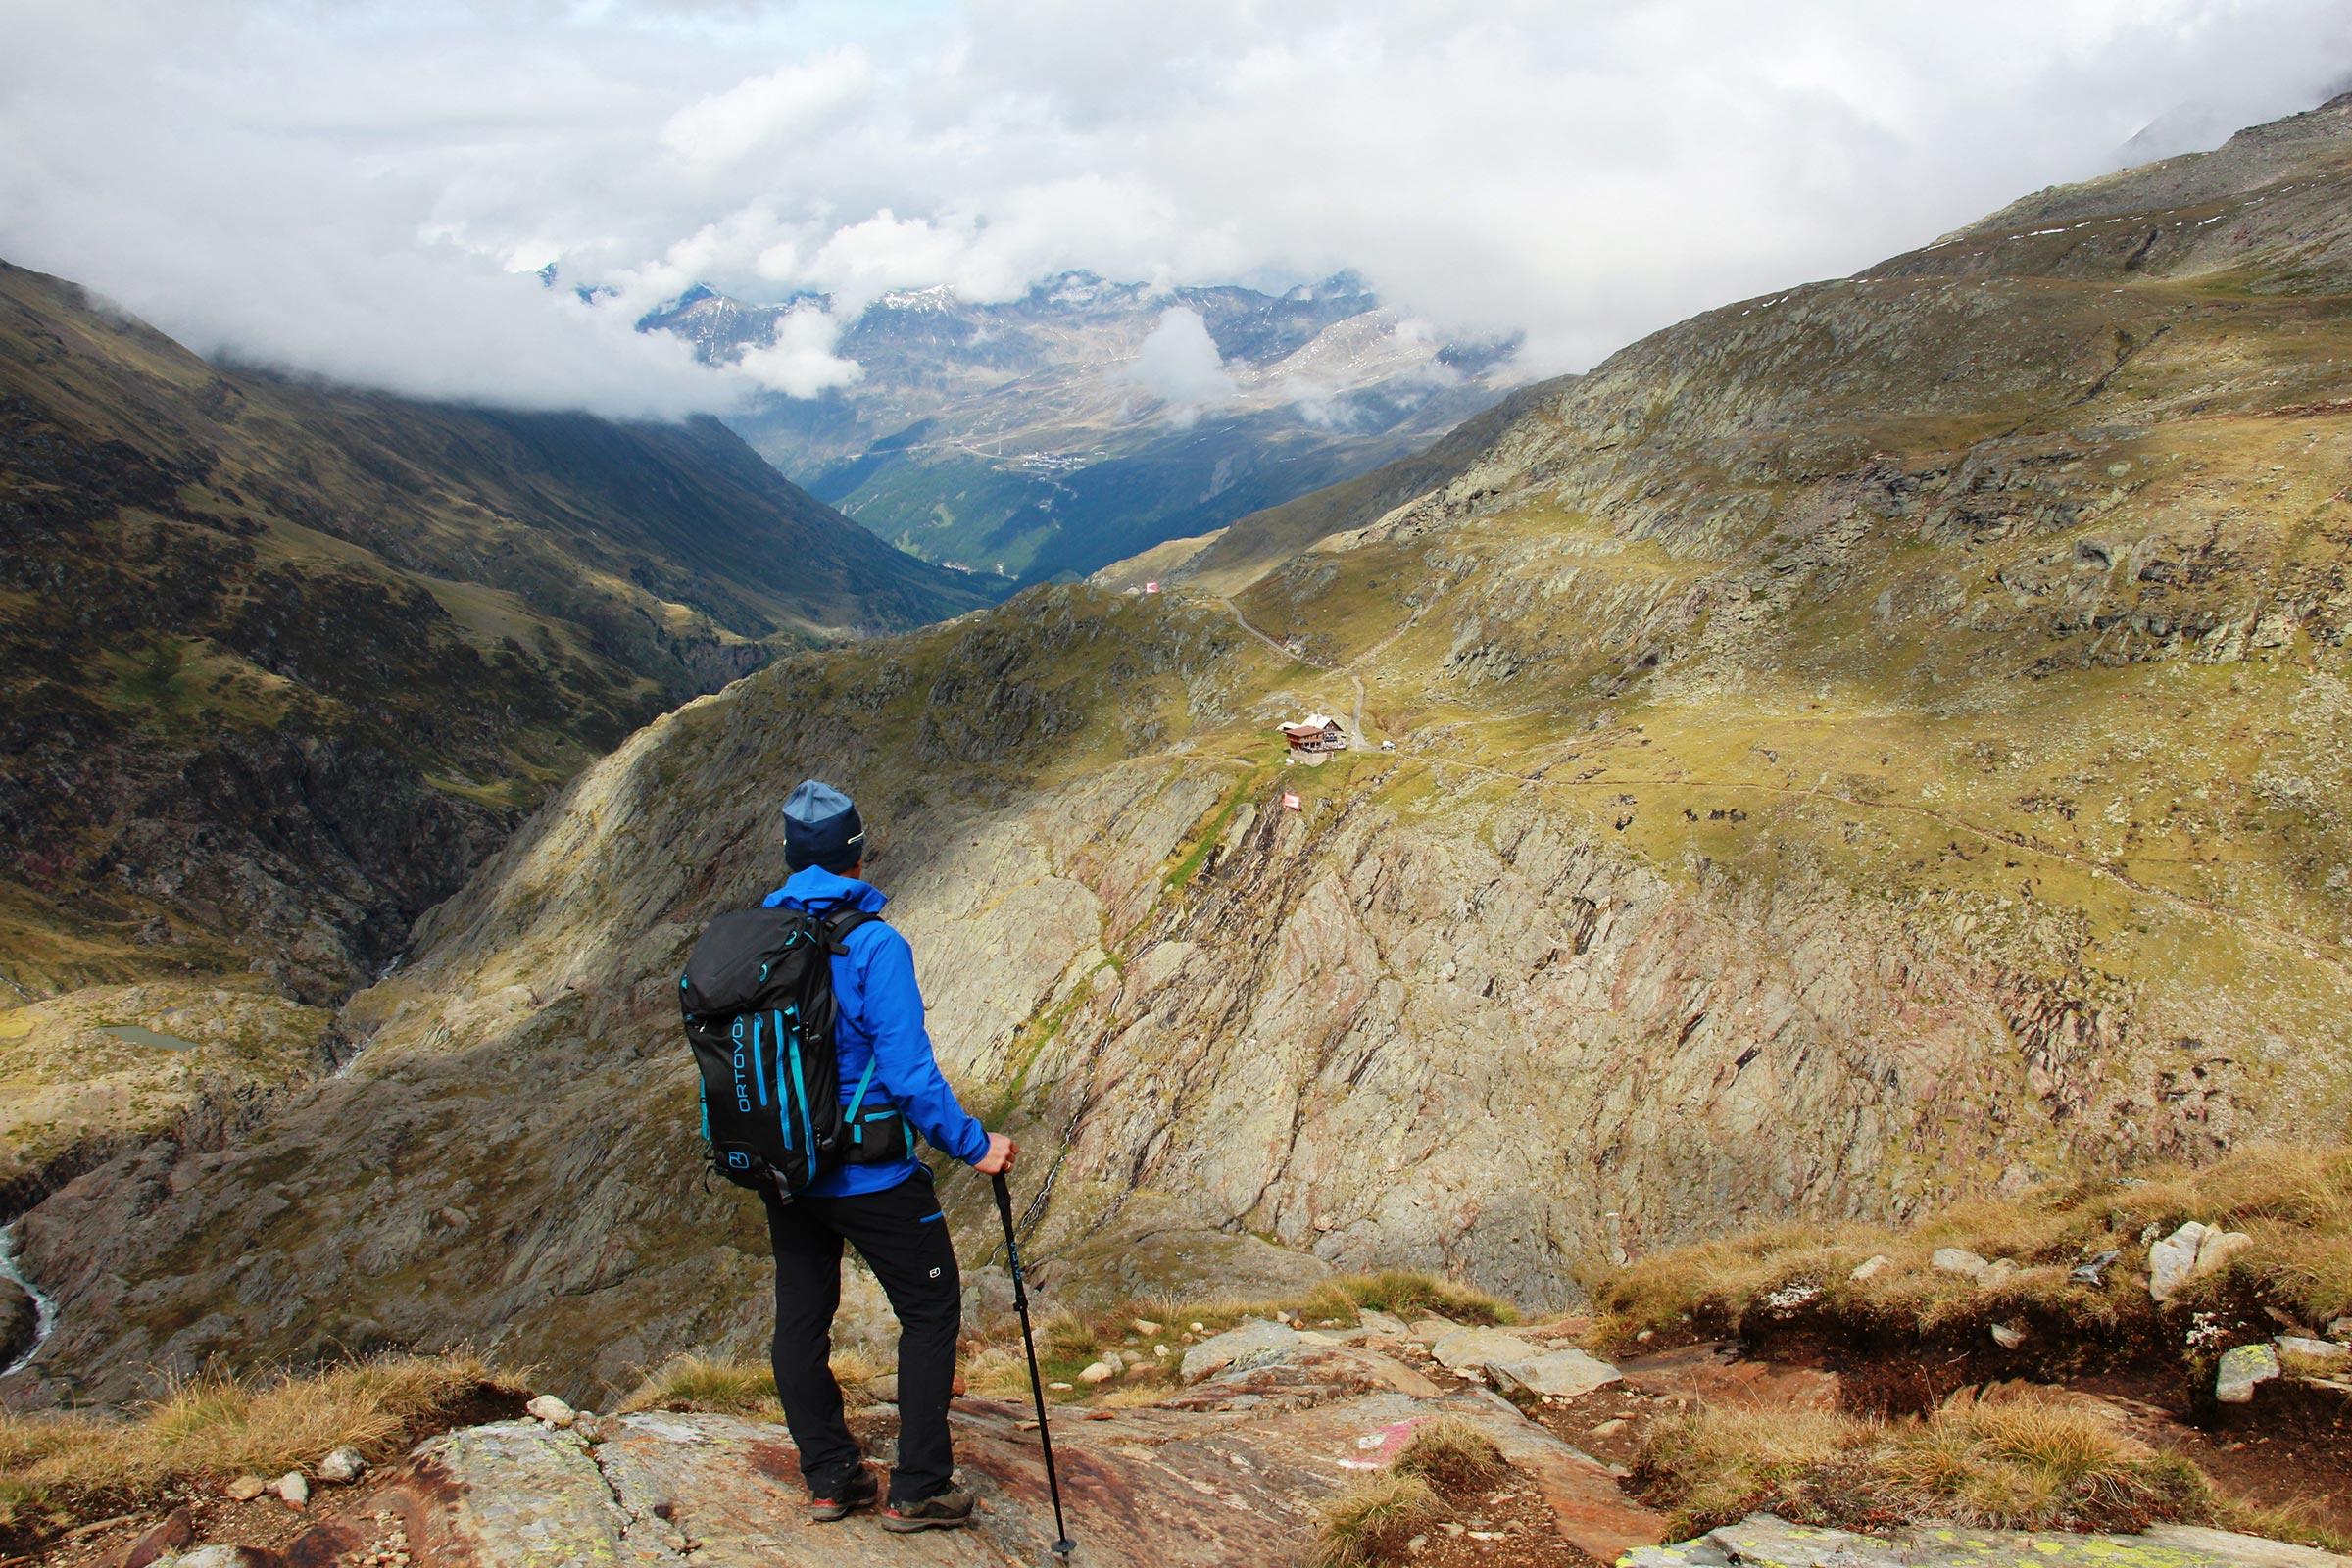 Blick auf die Langtalereckhütte - Piccard Rundweg Obergurgl-Hochgurgl